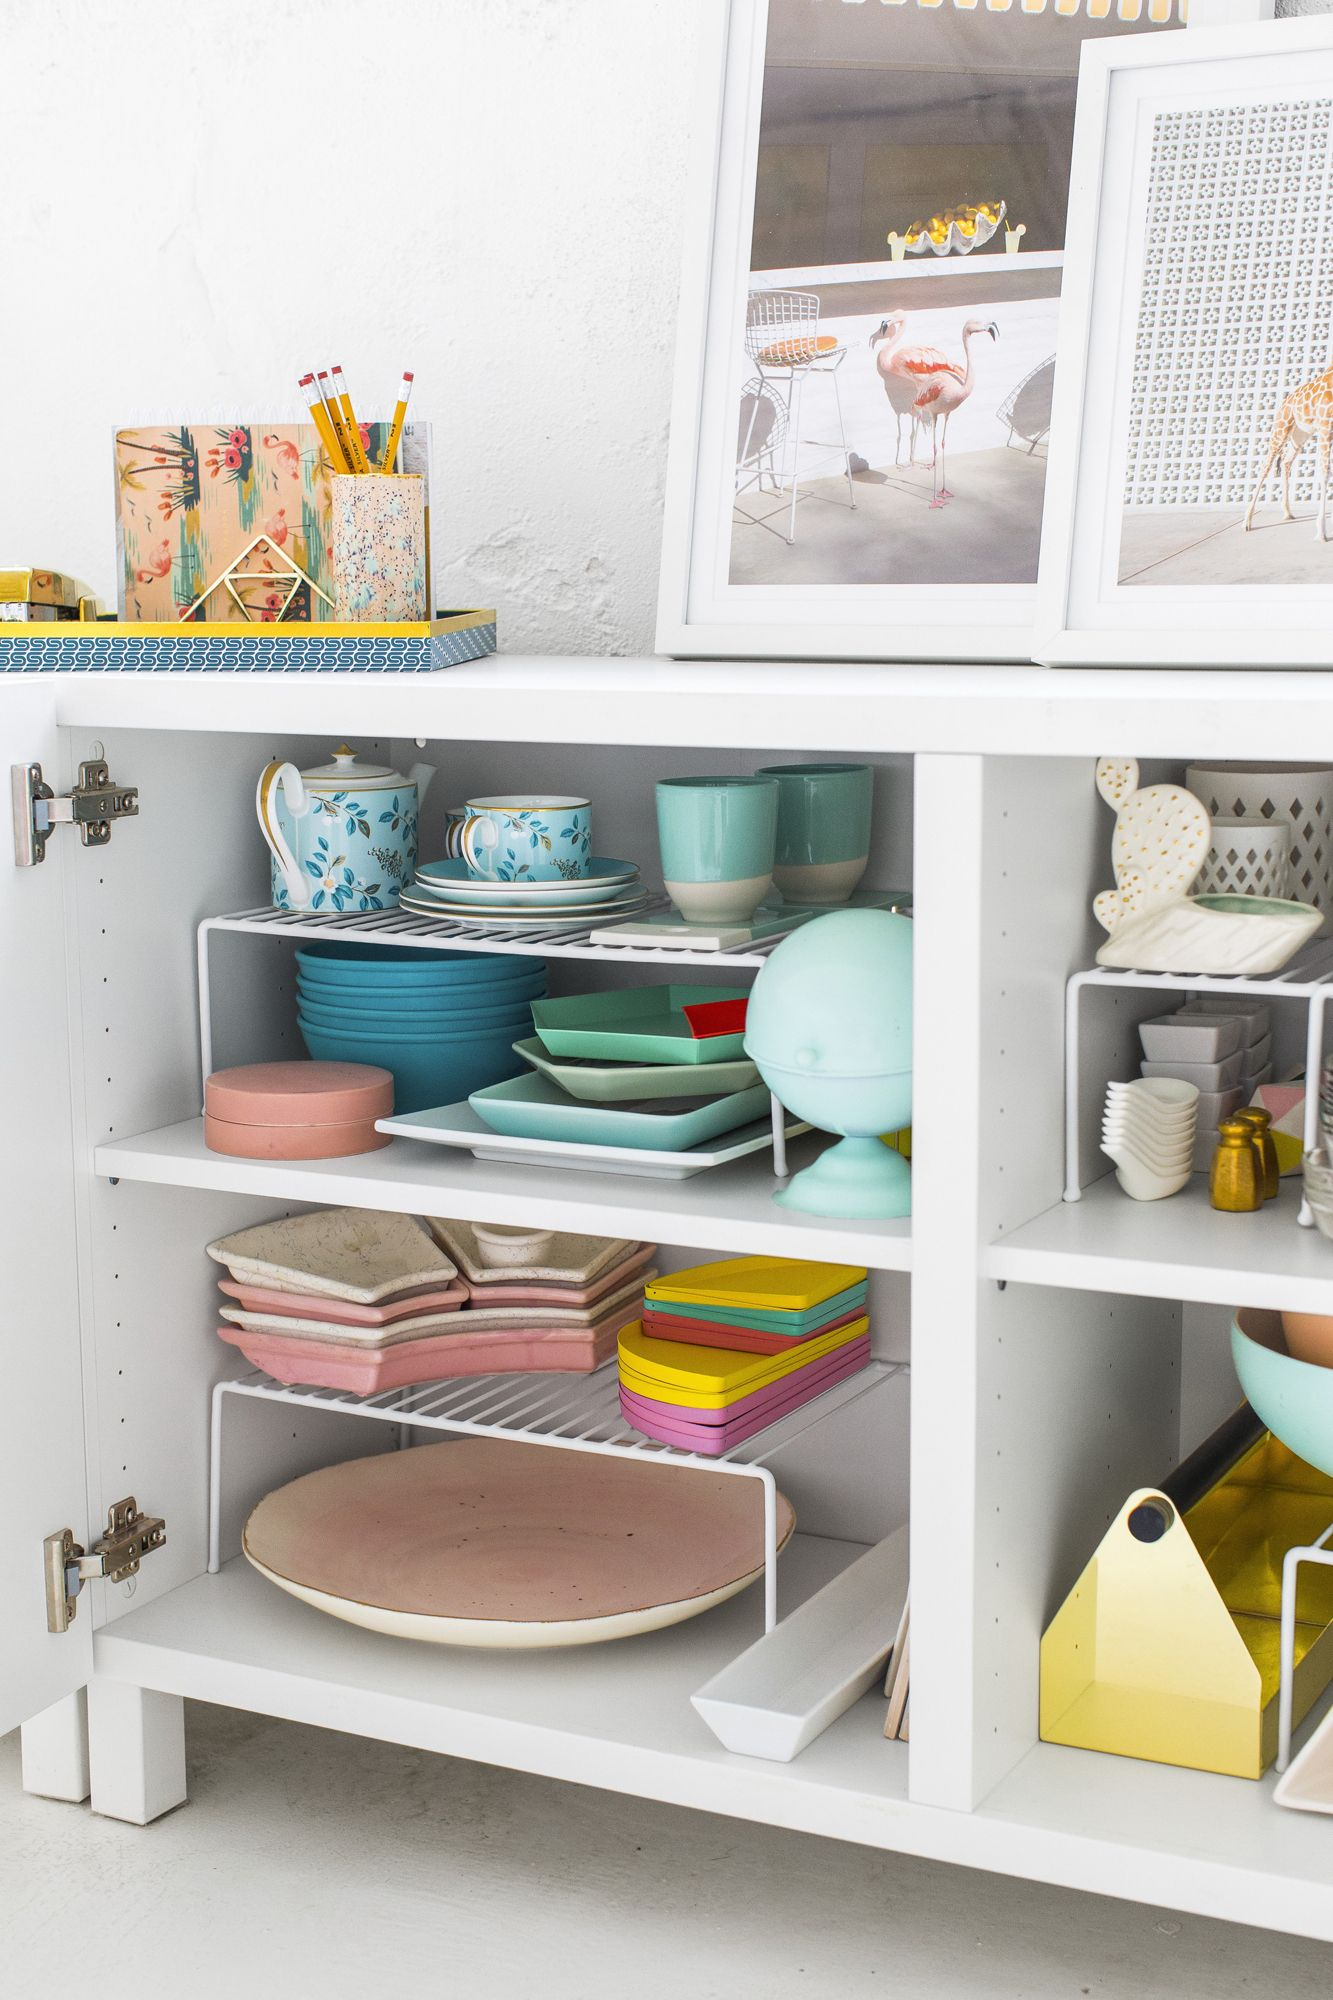 22 Kitchen Organization Ideas Kitchen Organizing Tips And